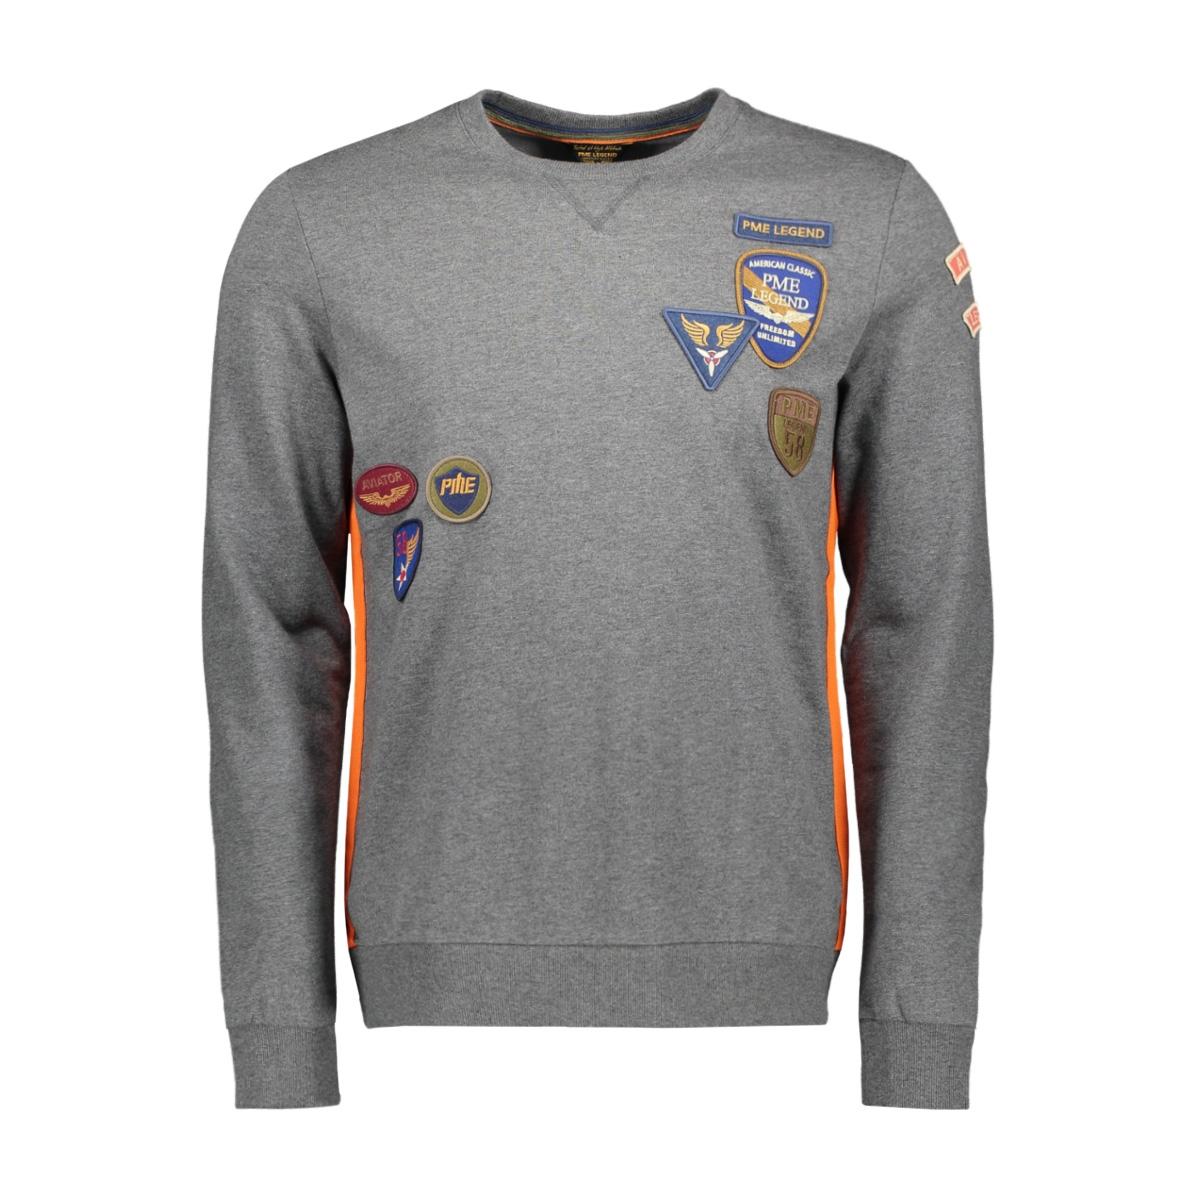 light terry crewneck pts195503 pme legend t-shirt 940